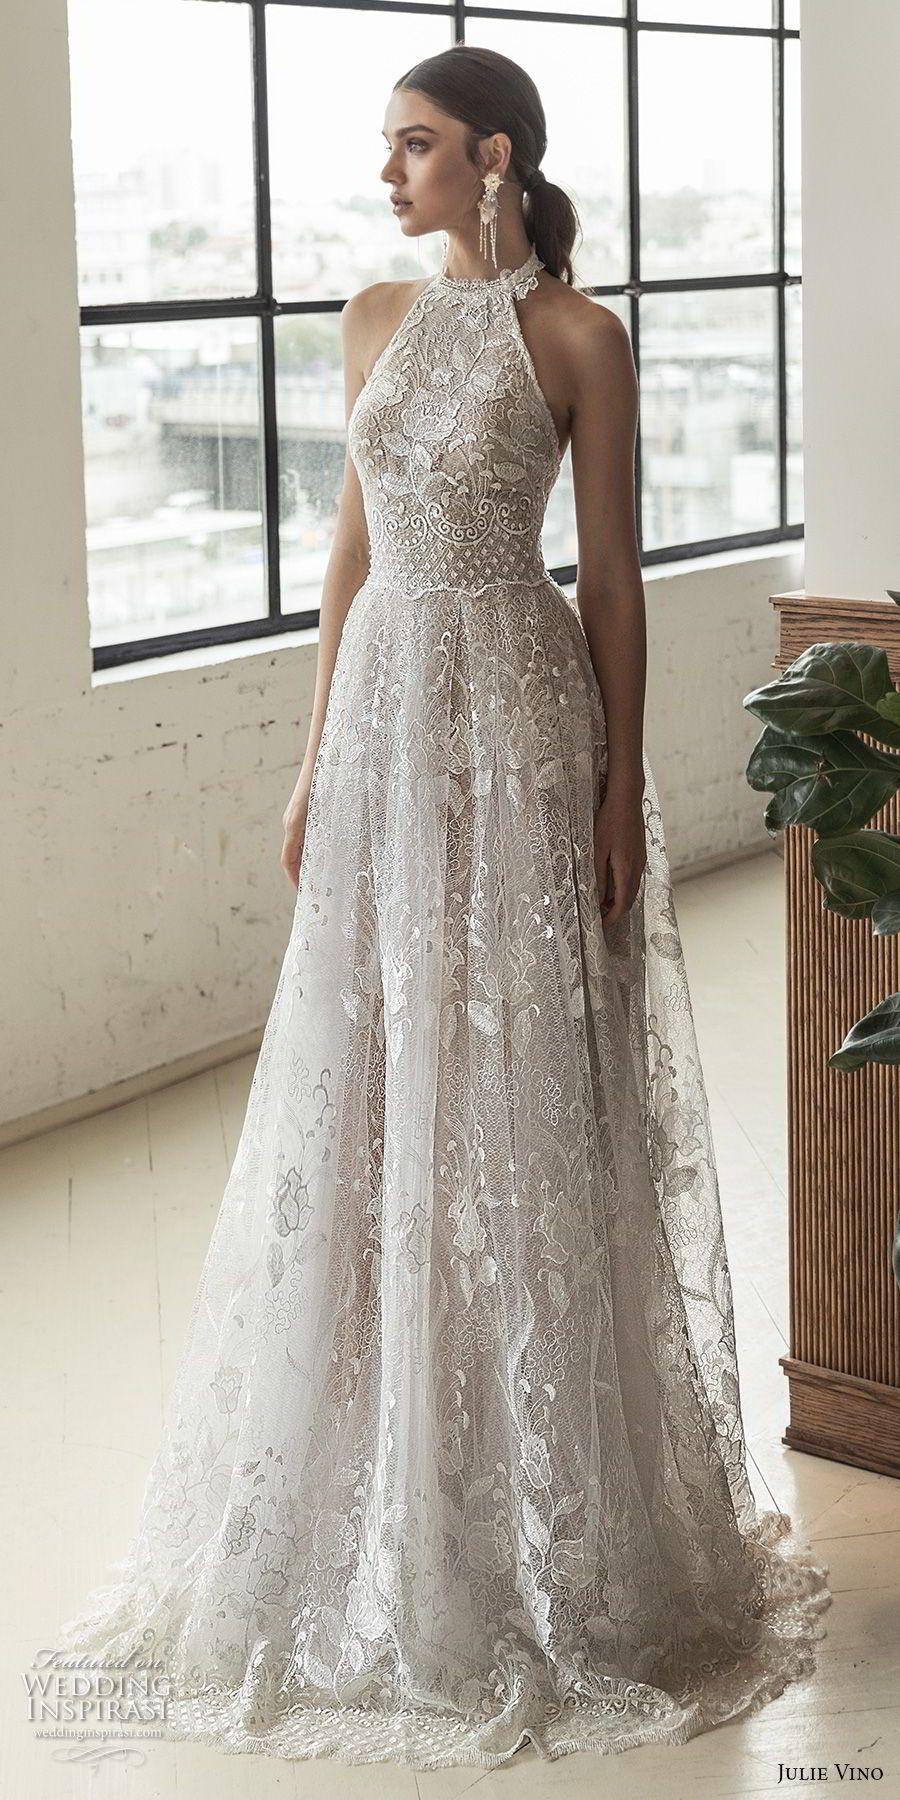 One of a kind wedding dresses  julie vino  romanzo bridal sleeveless halter jewel neck full